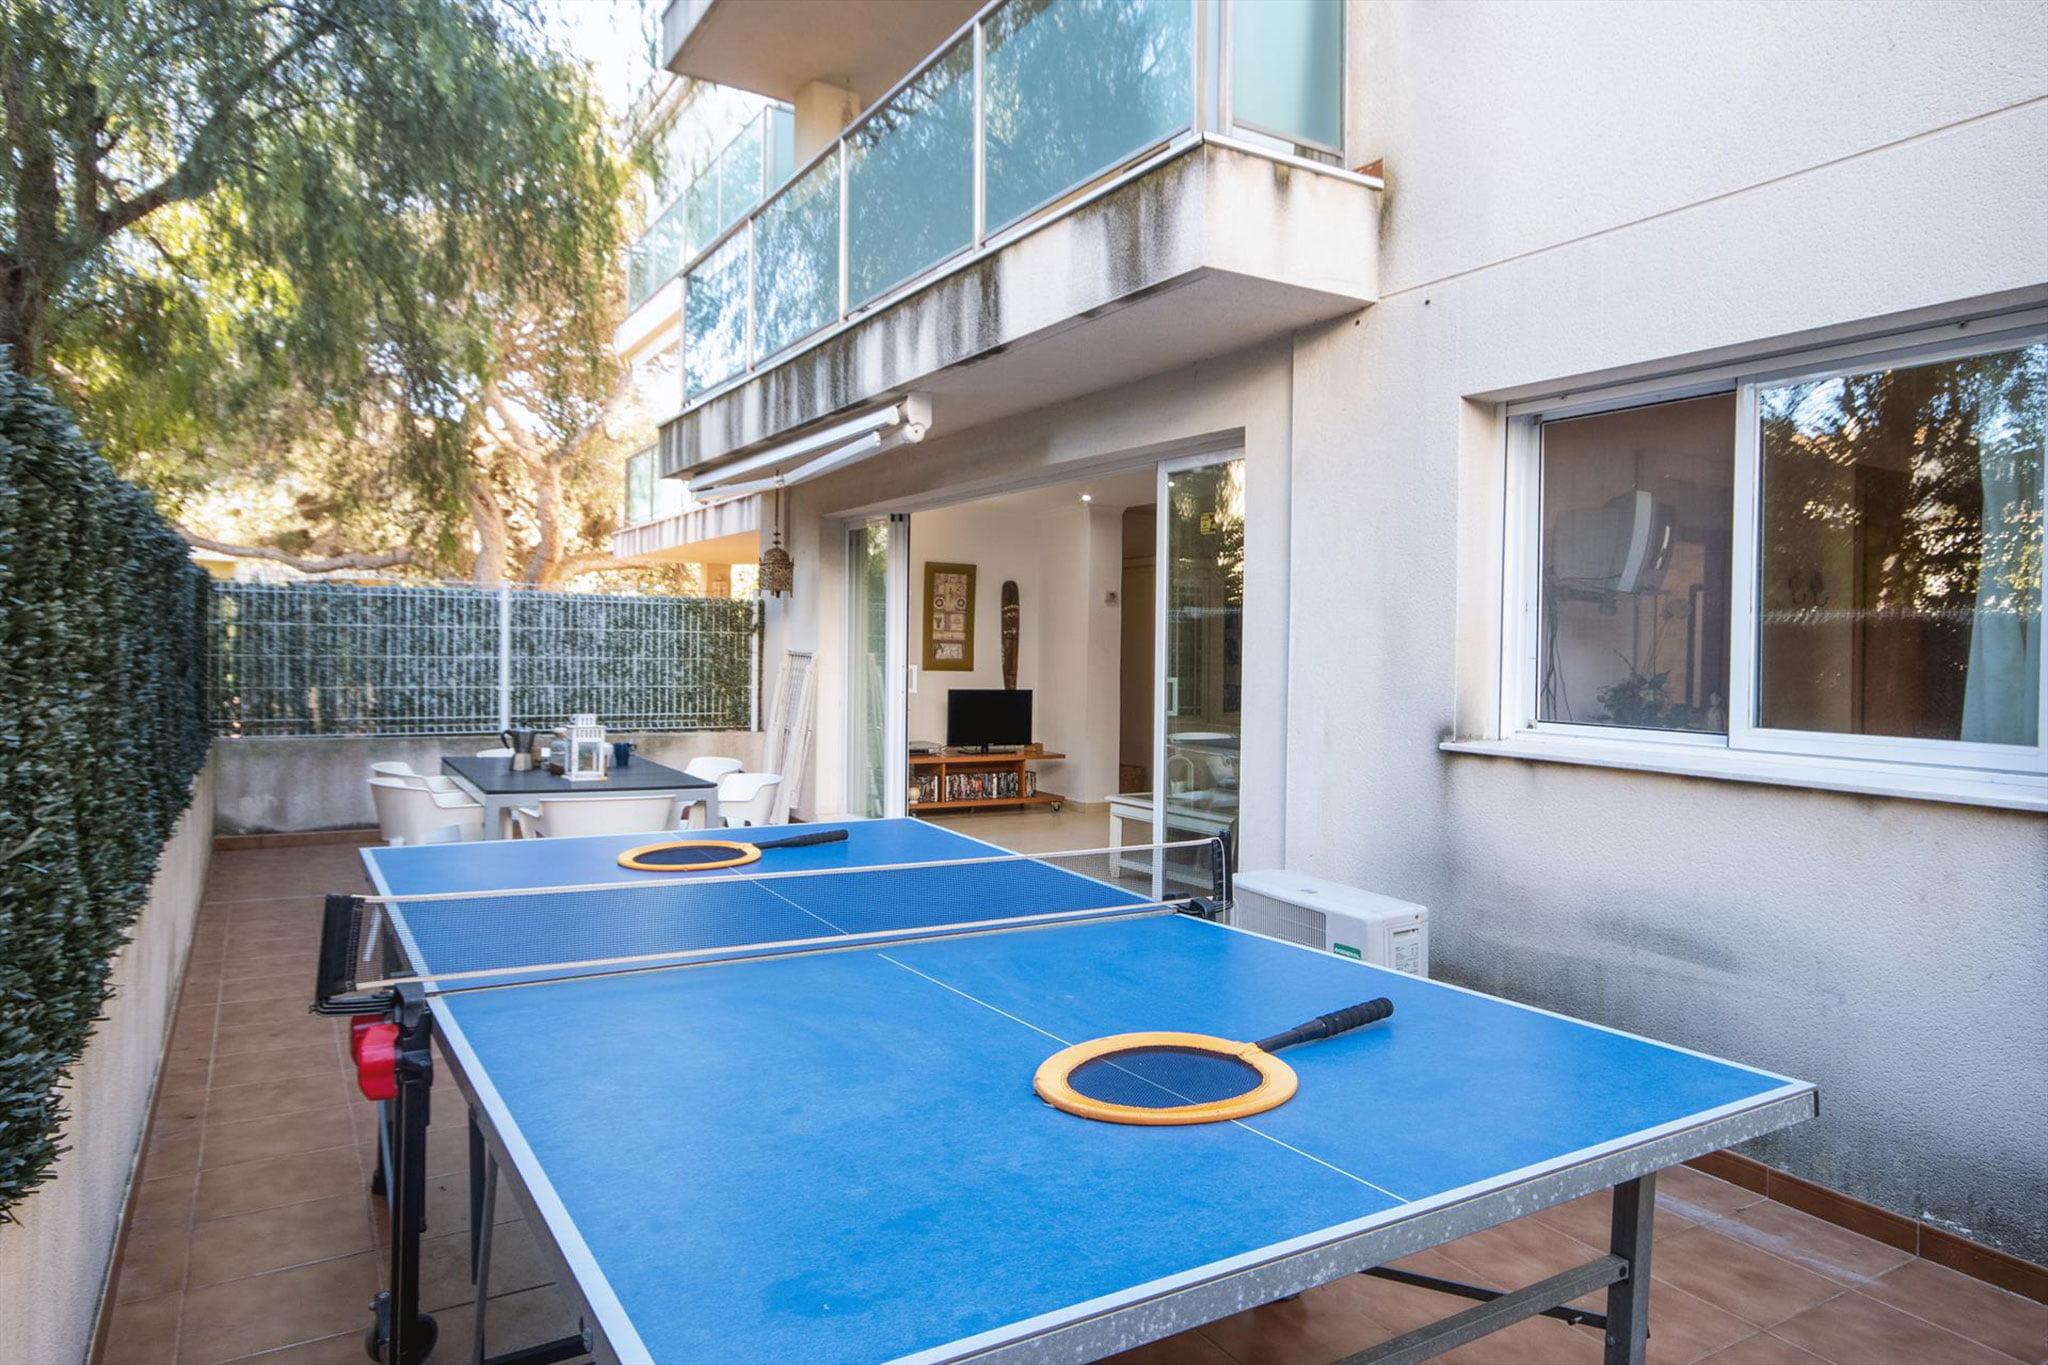 Mesas de ping pong en un apartamento de alquiler en Jávea – Aguila Rent a Villa